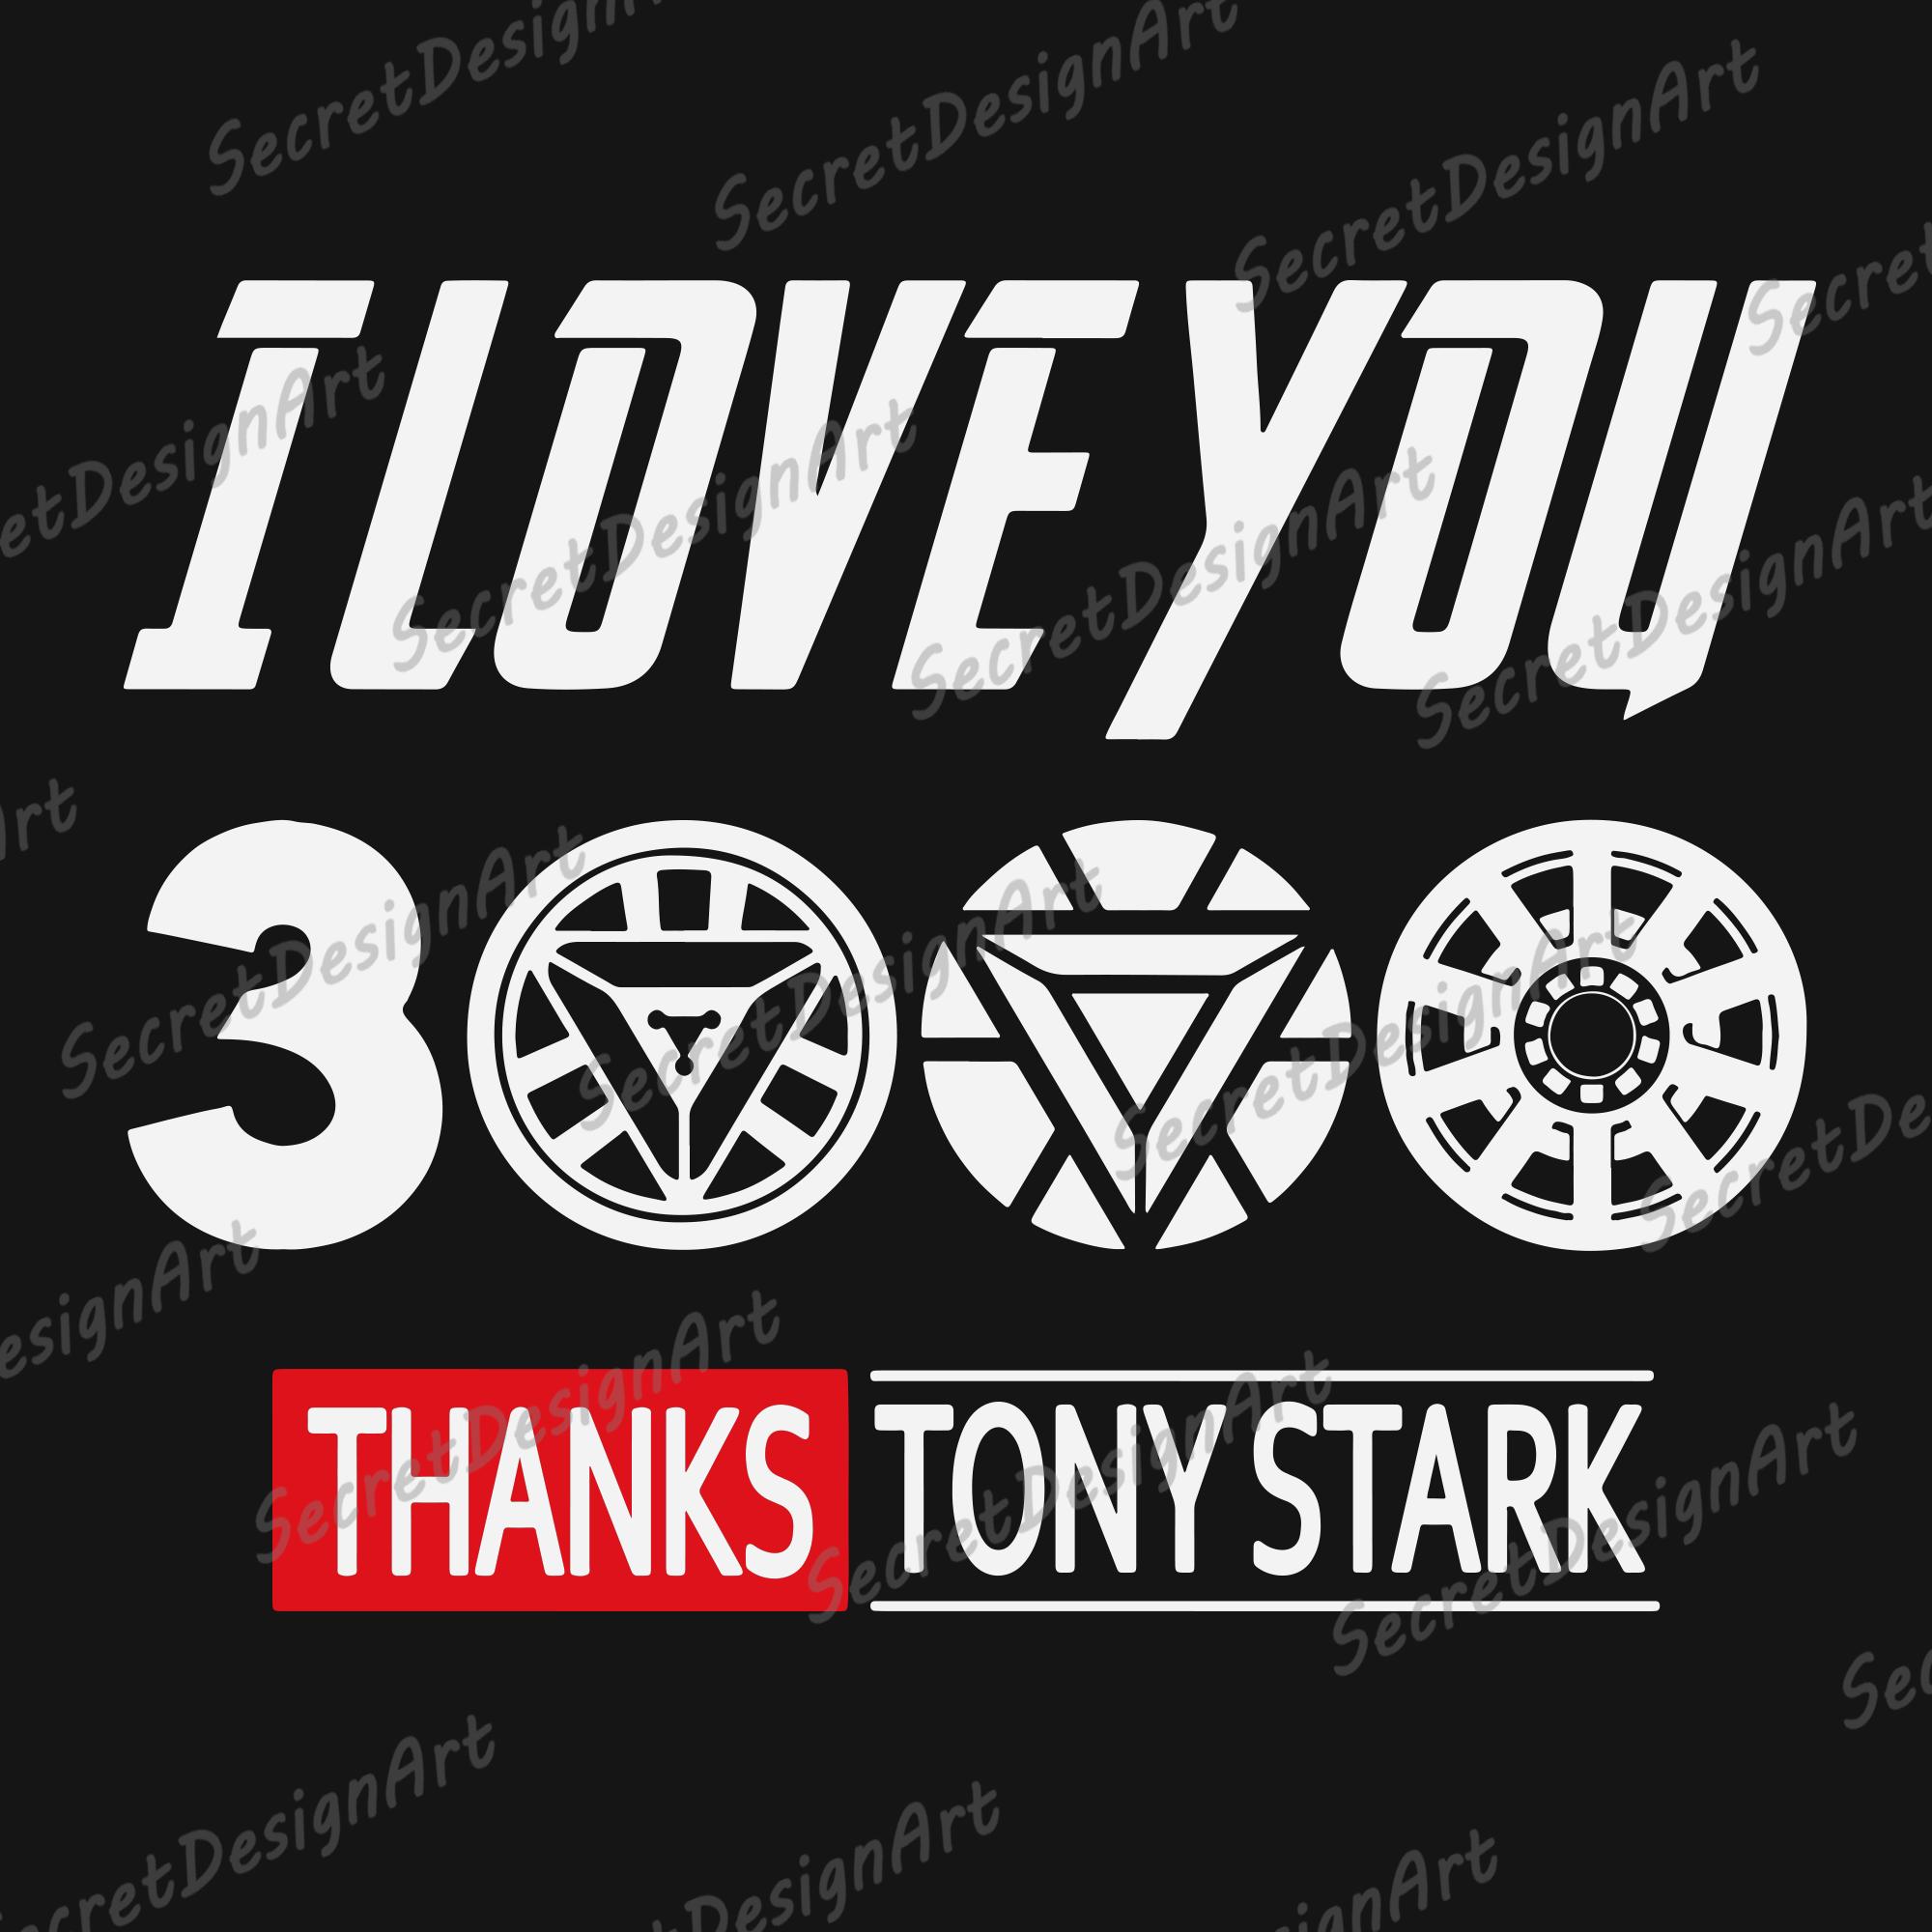 I Love You 3000 Svg Avengers Endgame Father S Day Svg Svg Secret Shop My Love Tony Stark Svg